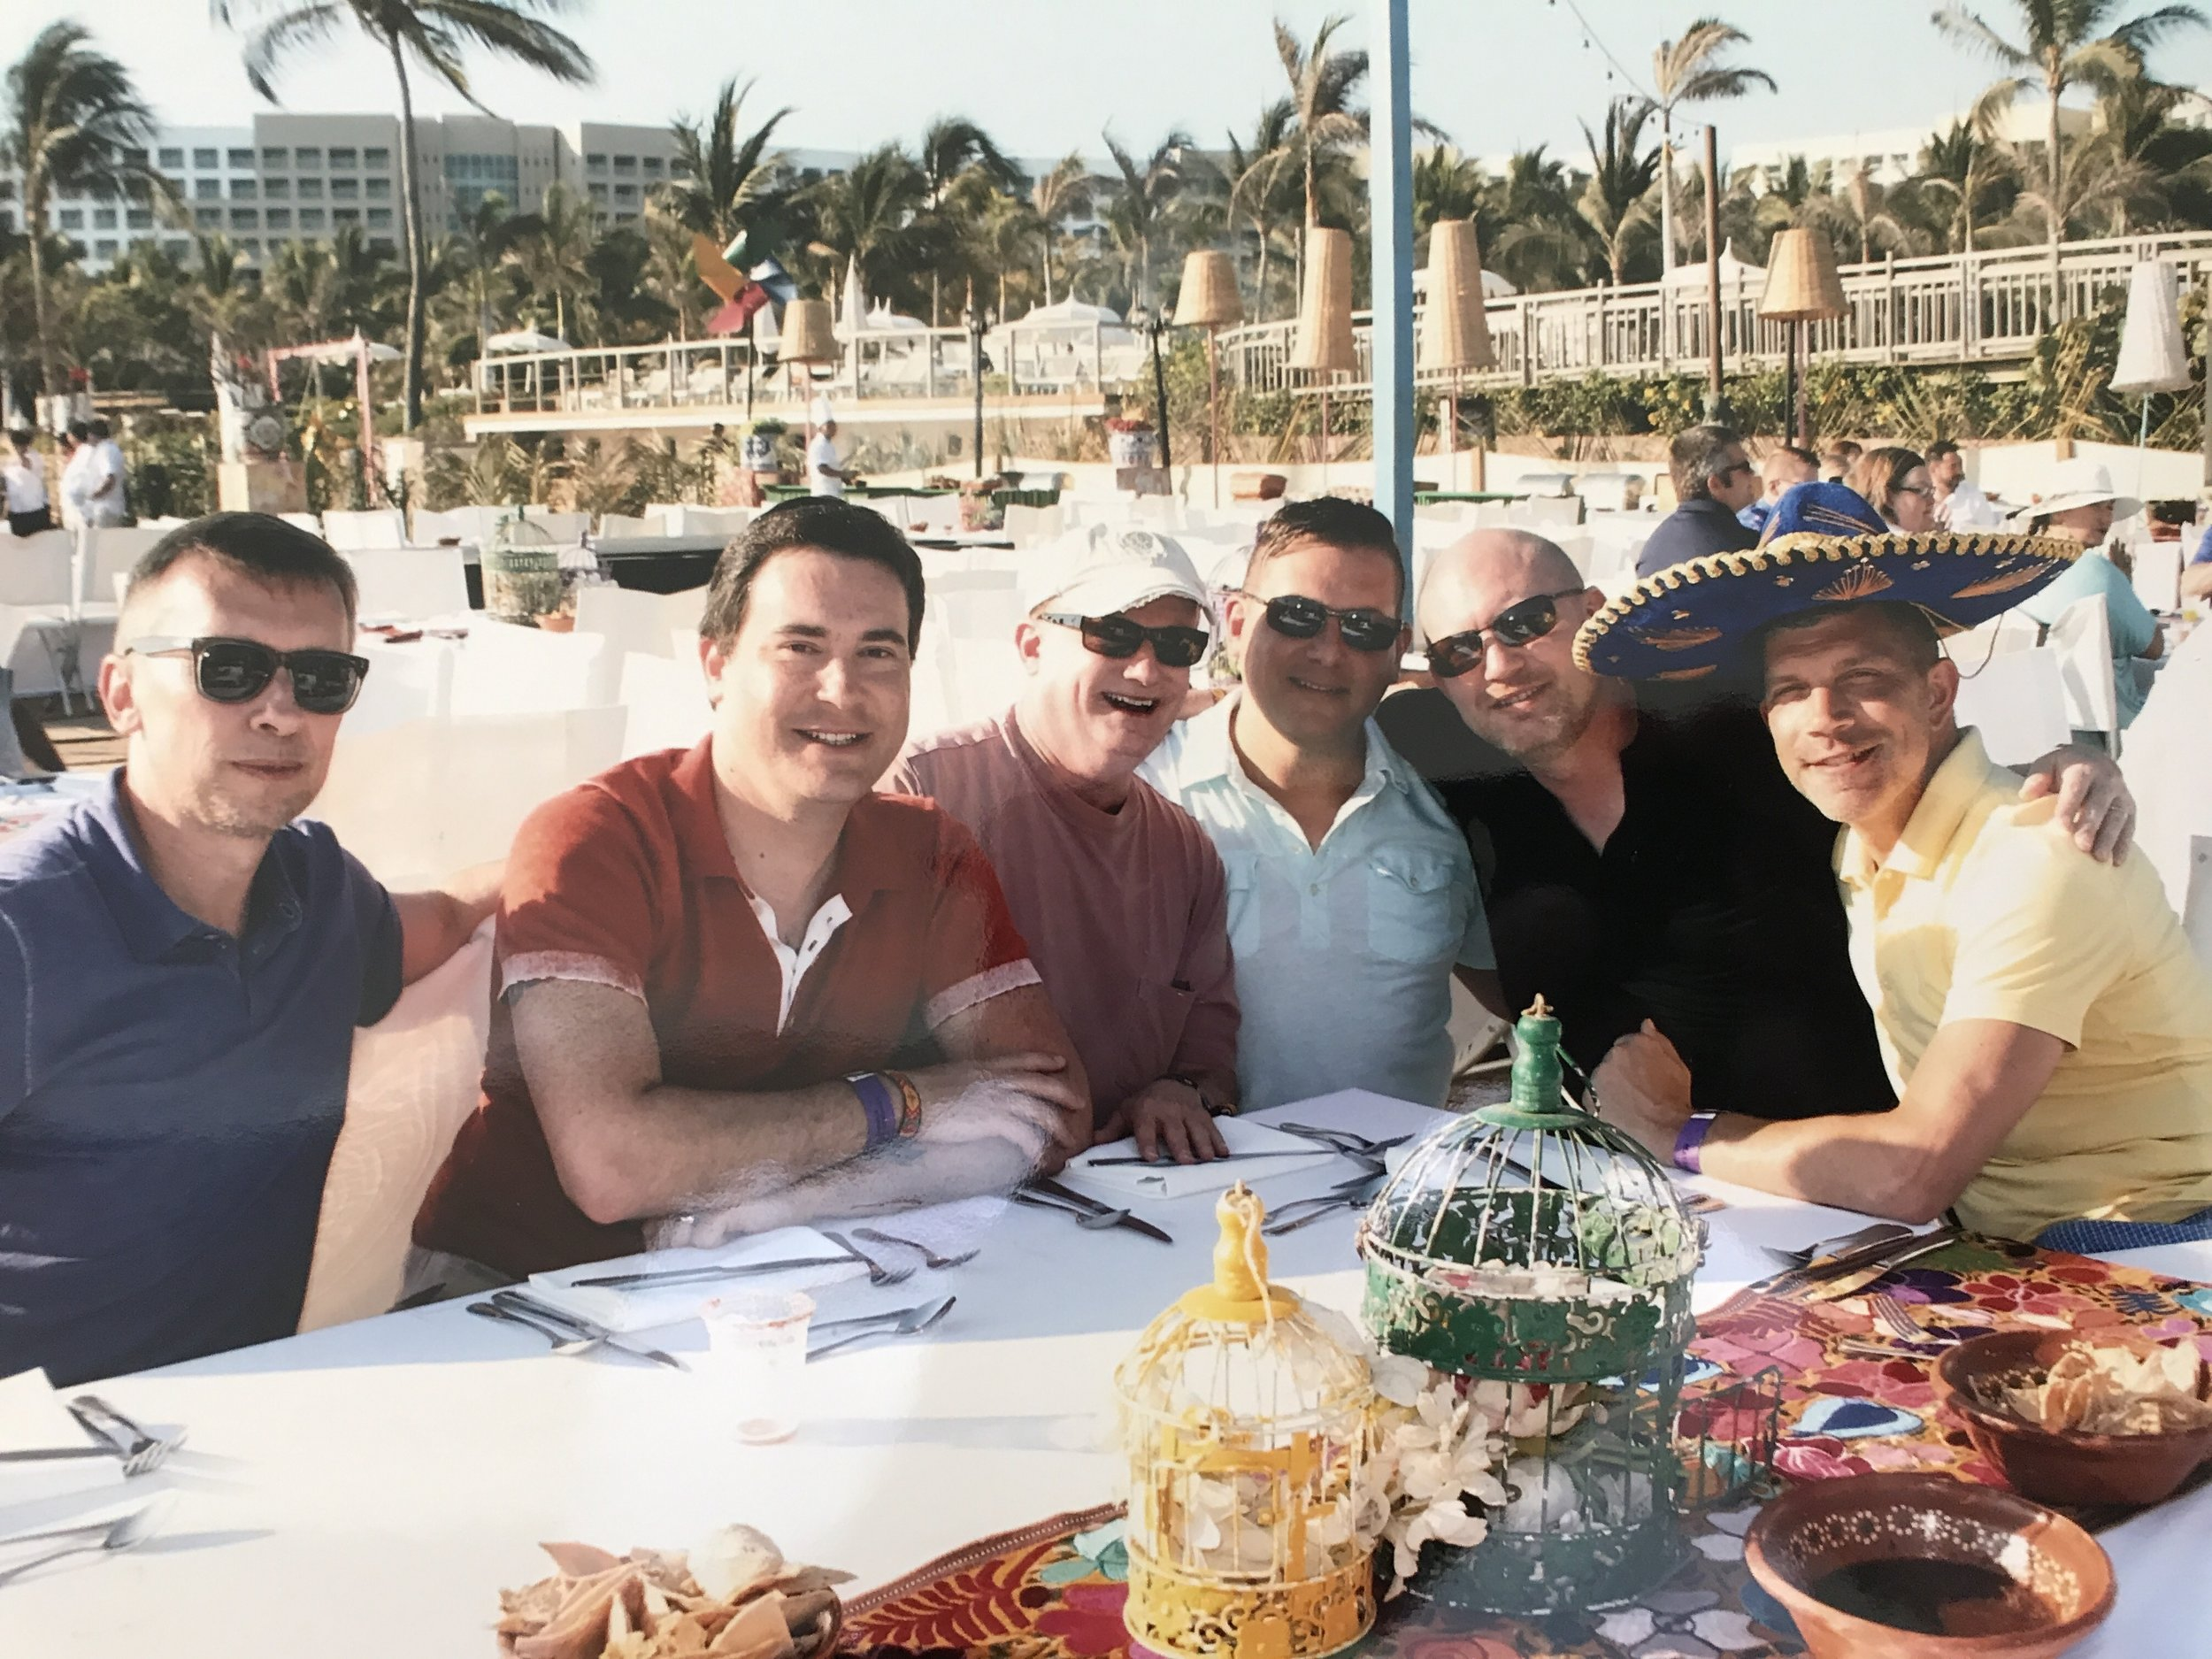 Fiesta on the beach with the boys